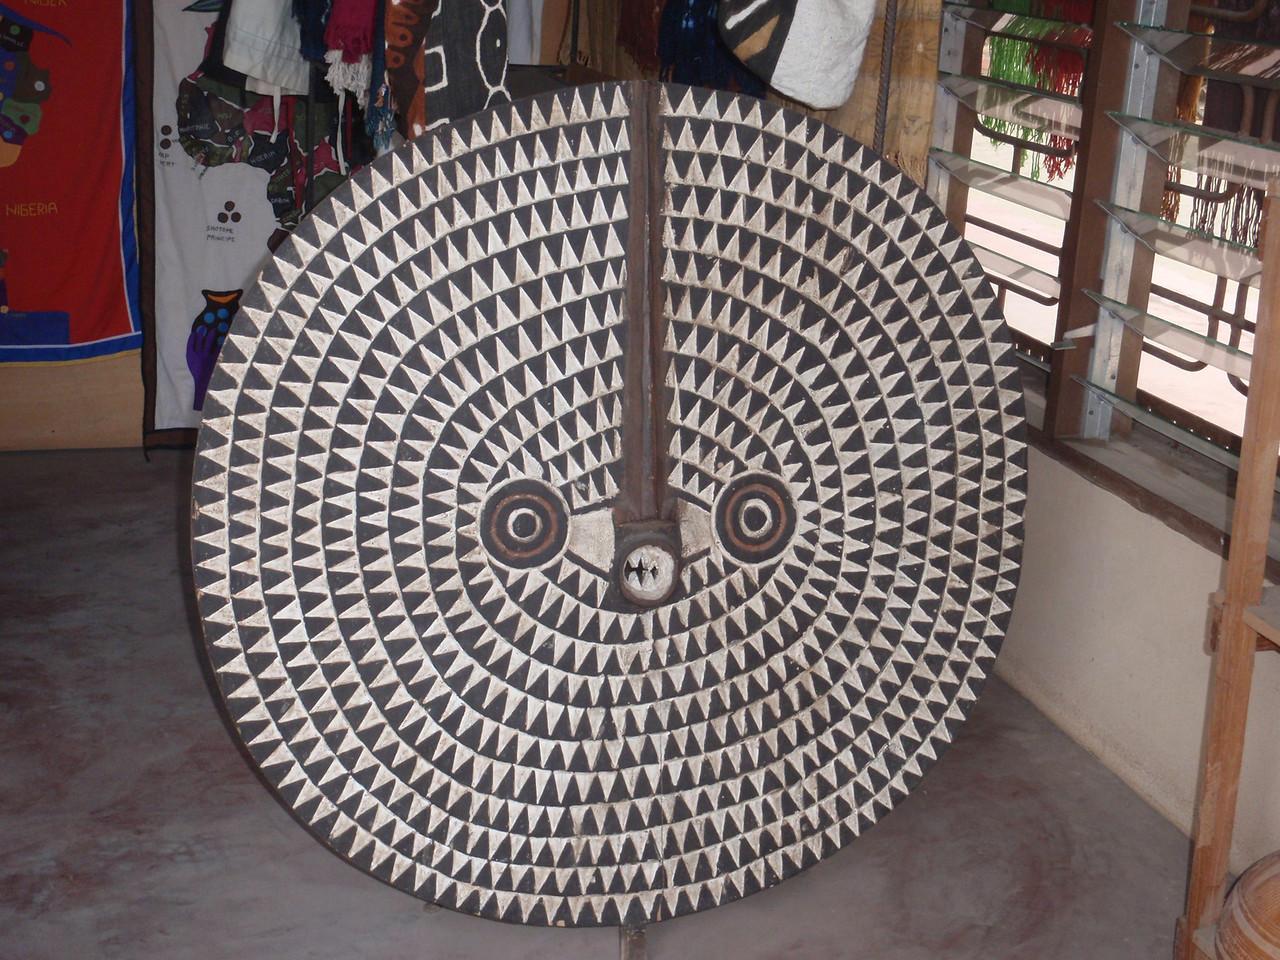 157_Cotonou  The Craft Market  Woodcarvings  Mask